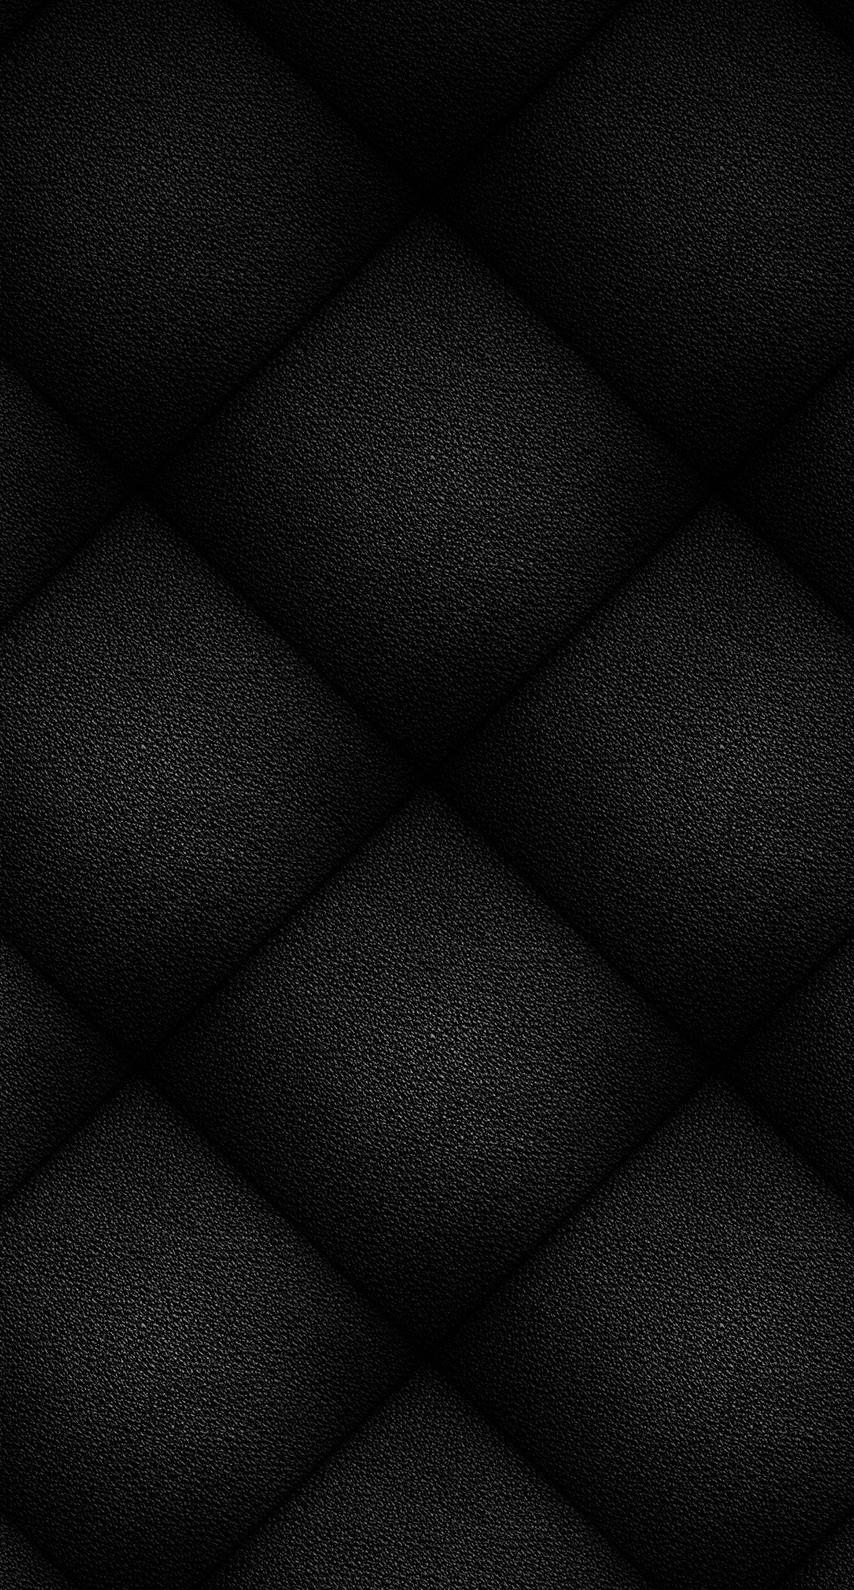 desktop, shape, no person, silhouette, monochrome, shadow, black and white, spotlight, stage